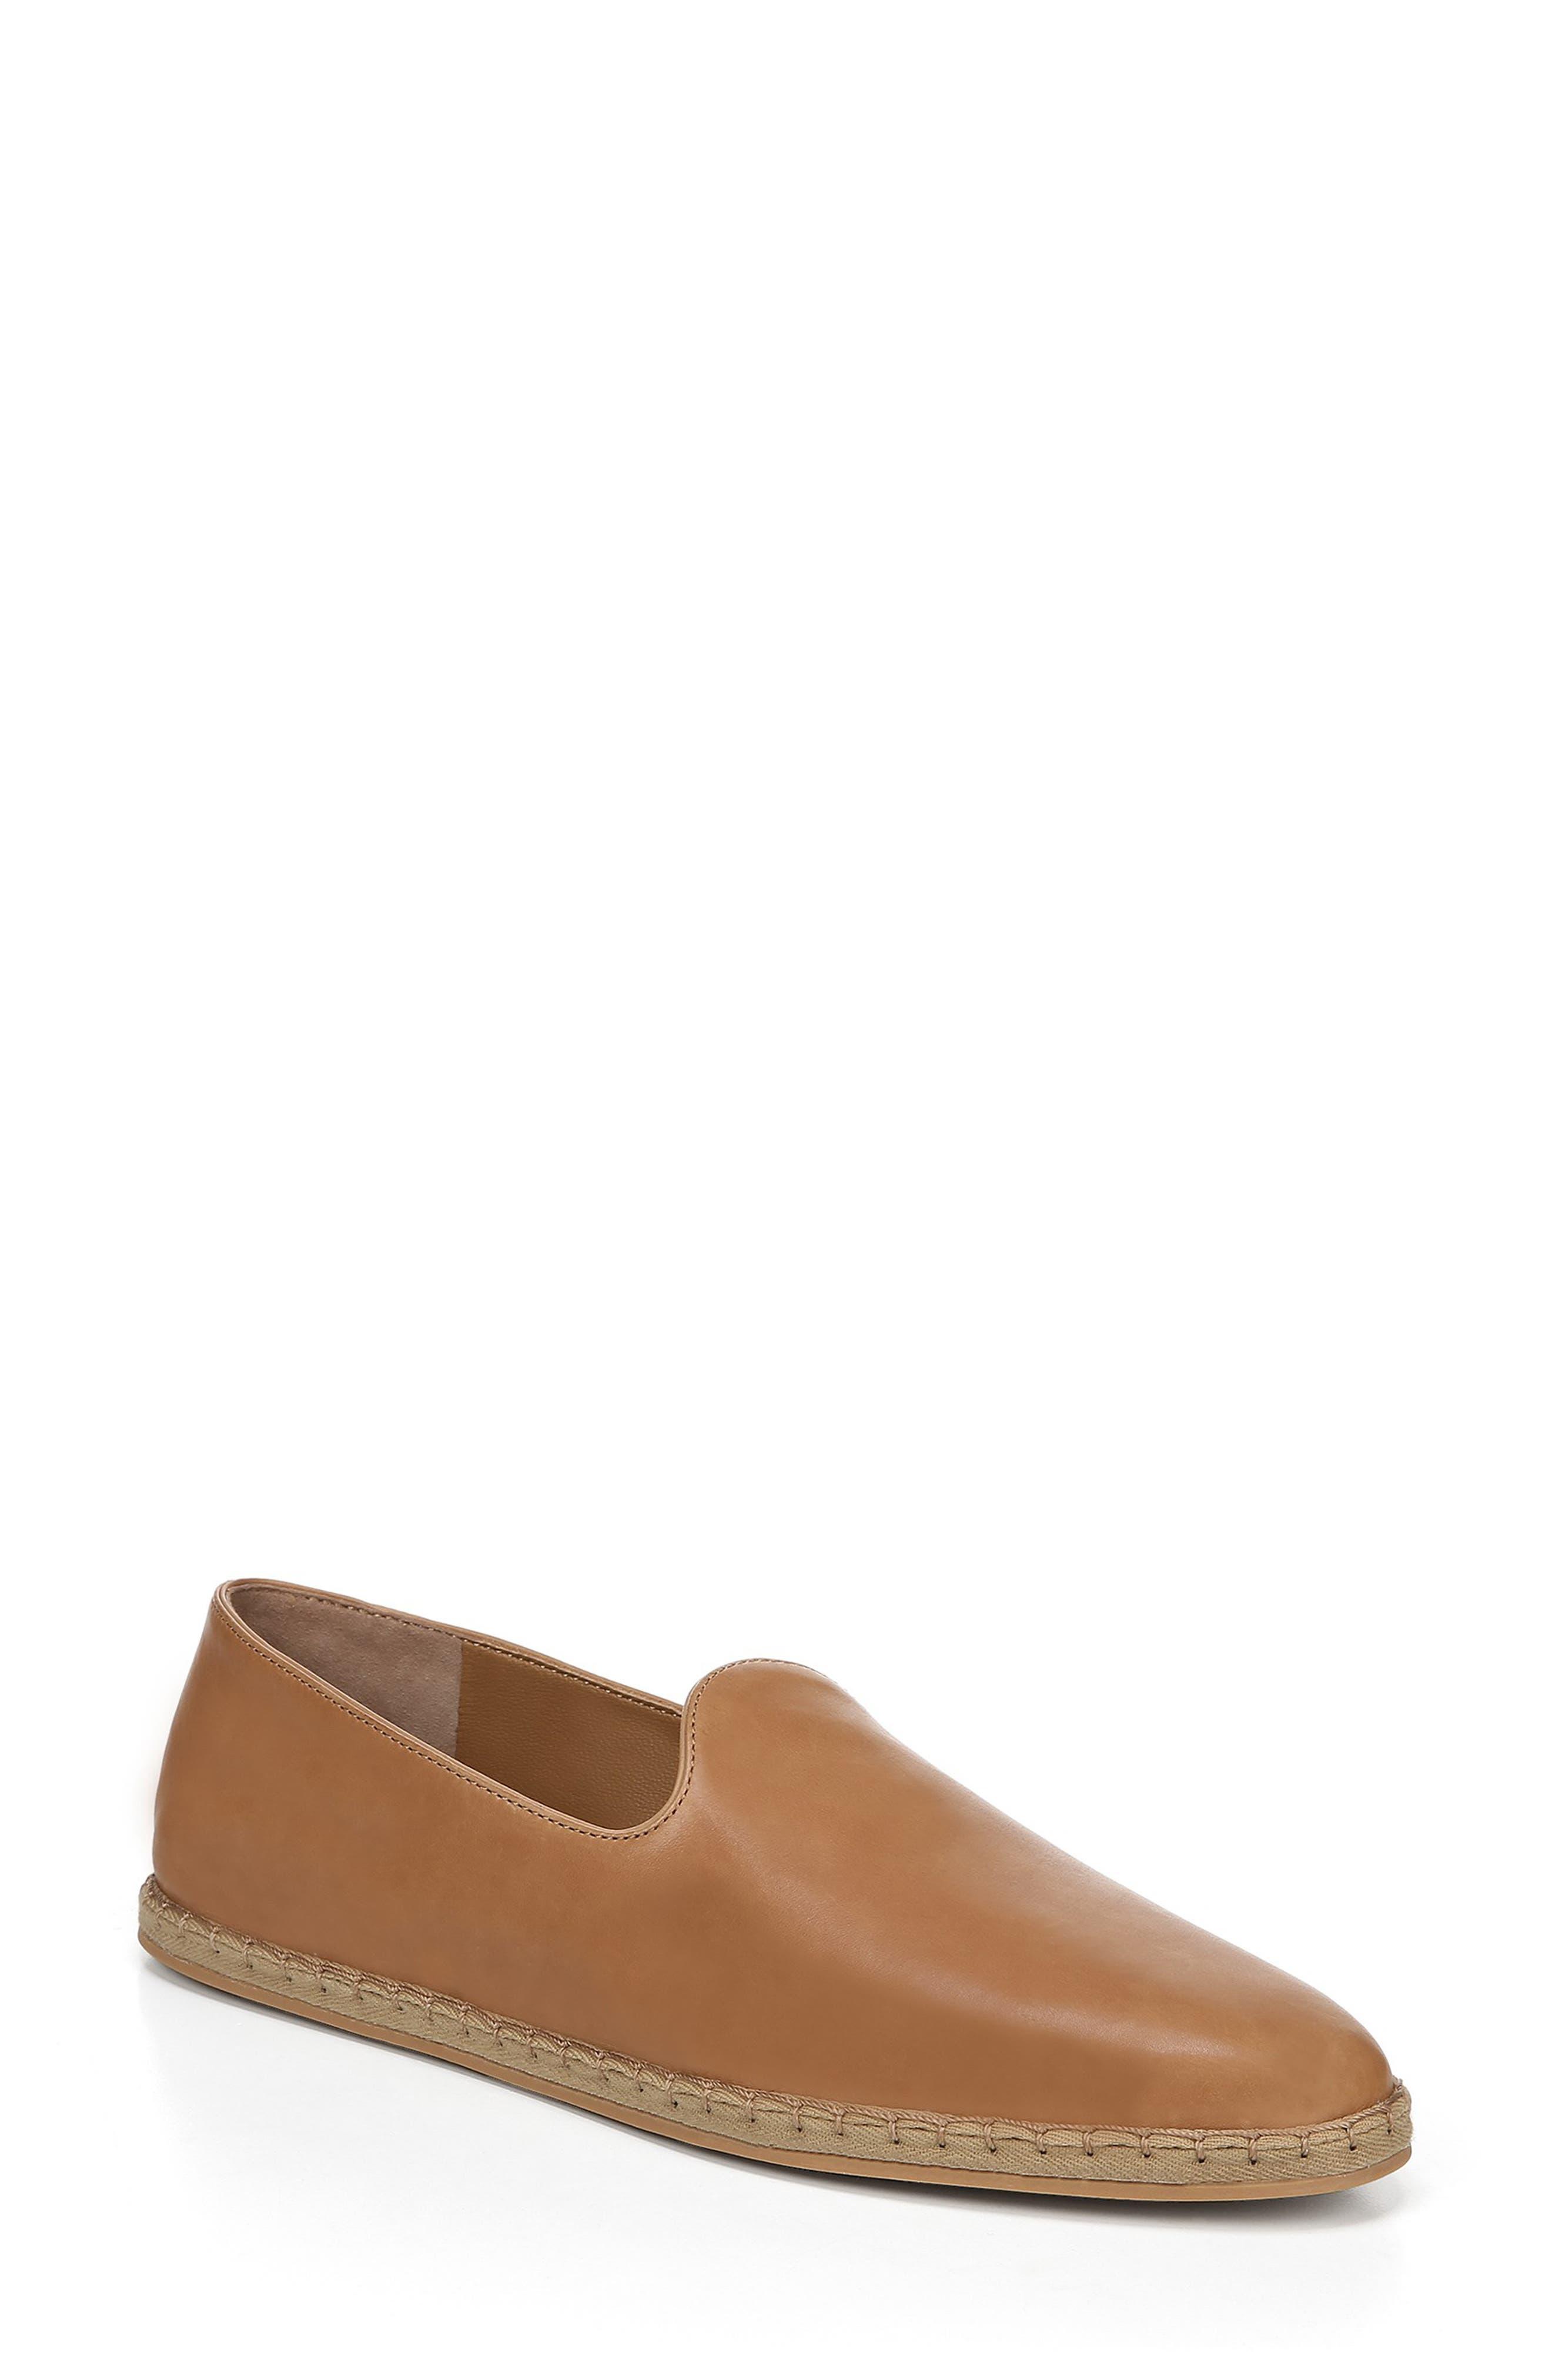 Malia Flat Foulard Leather Espadrille Loafers in Tan Leather